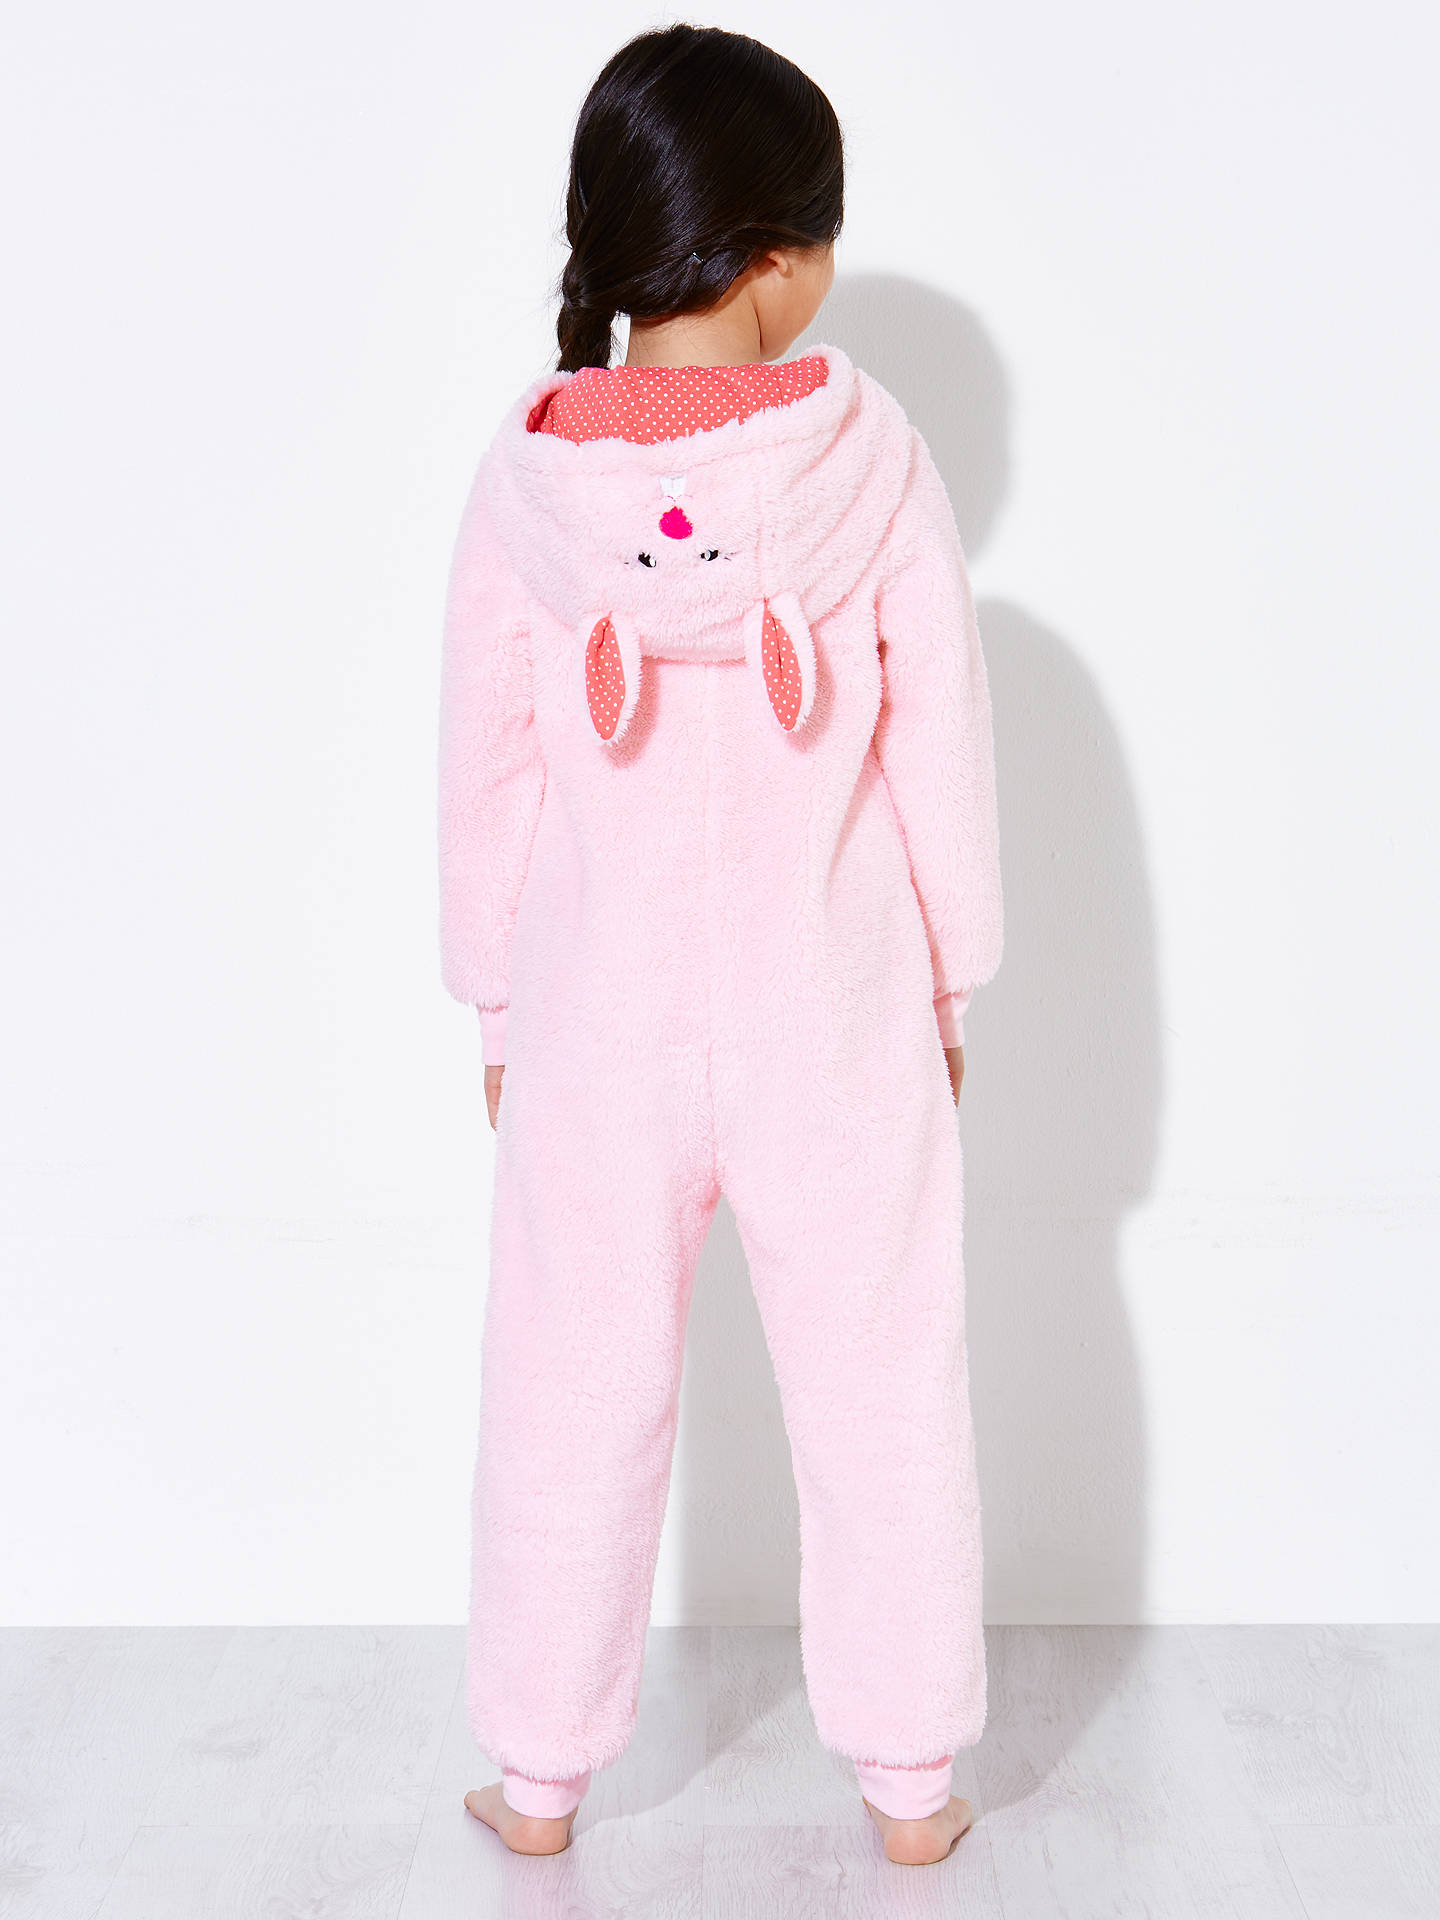 93480b9f8 John Lewis Children s Bunny Onesie